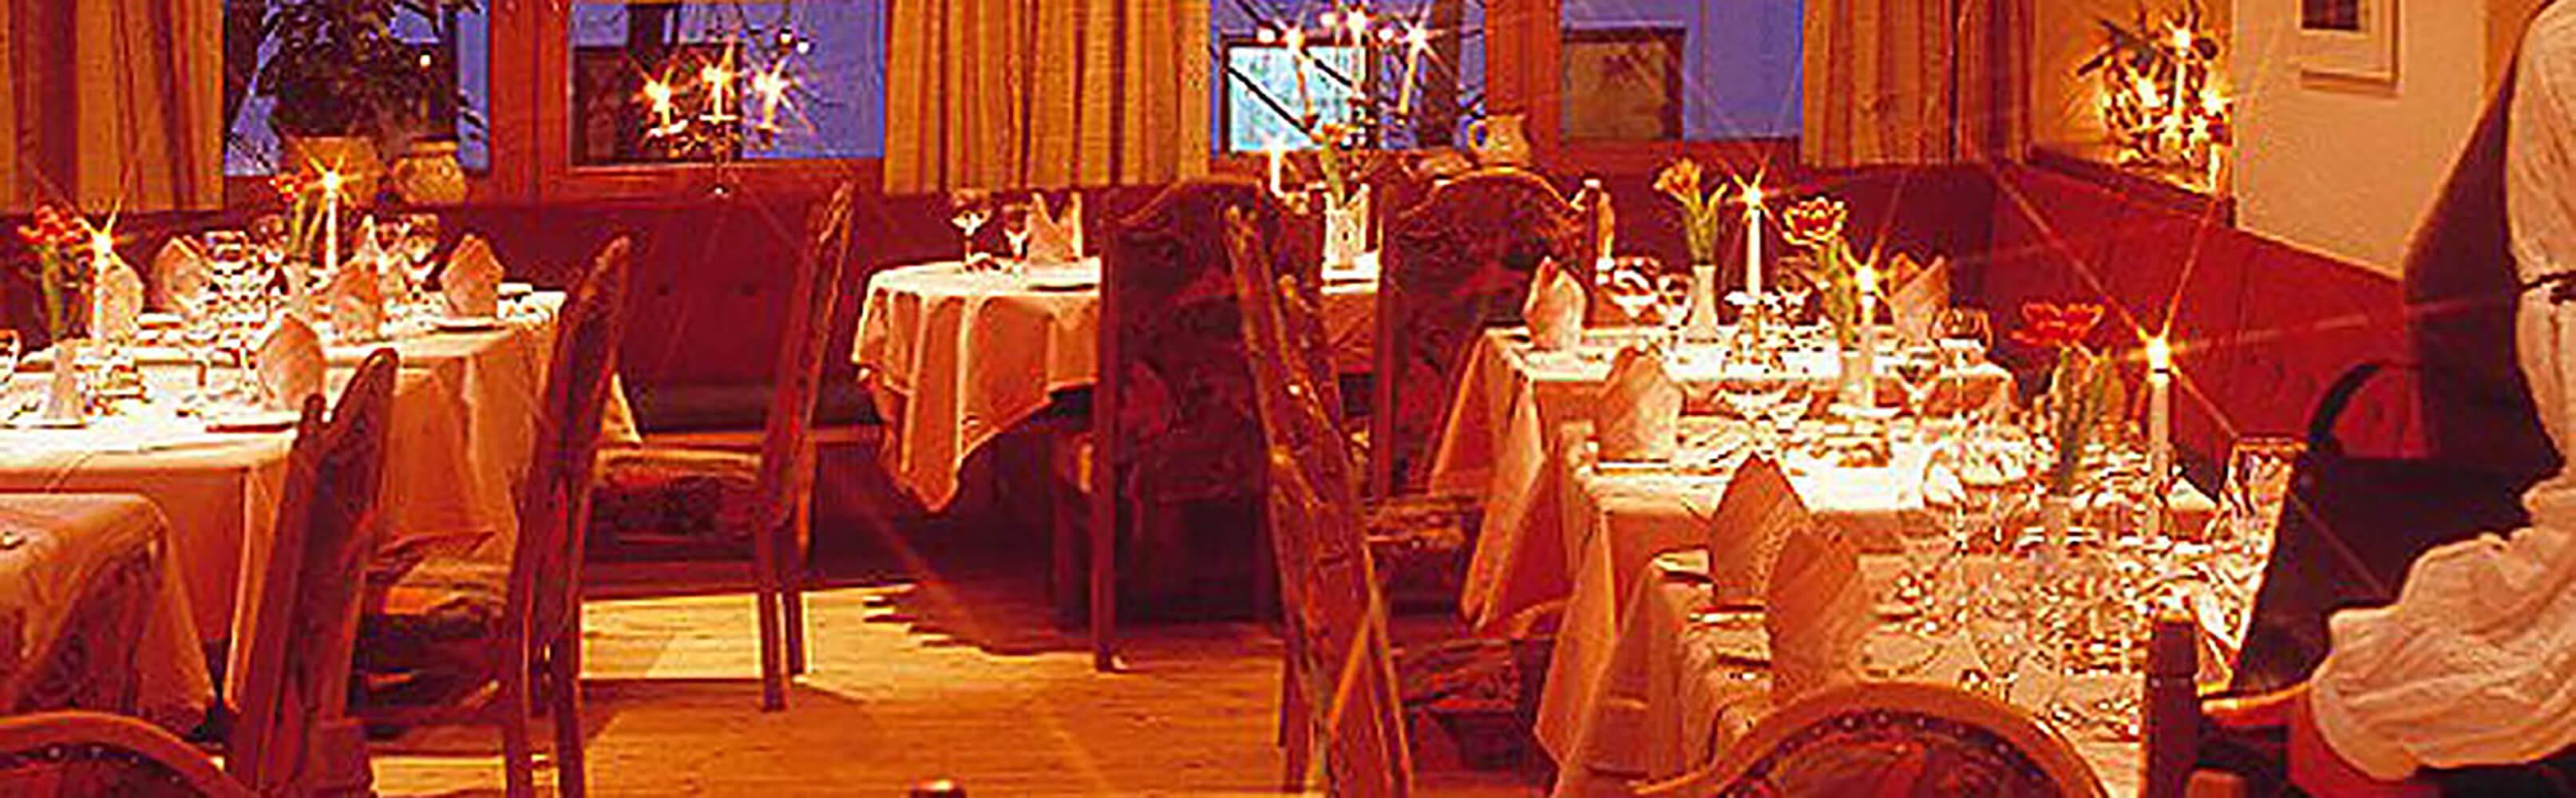 Familienhotel Adler Serfaus - Bei uns  1